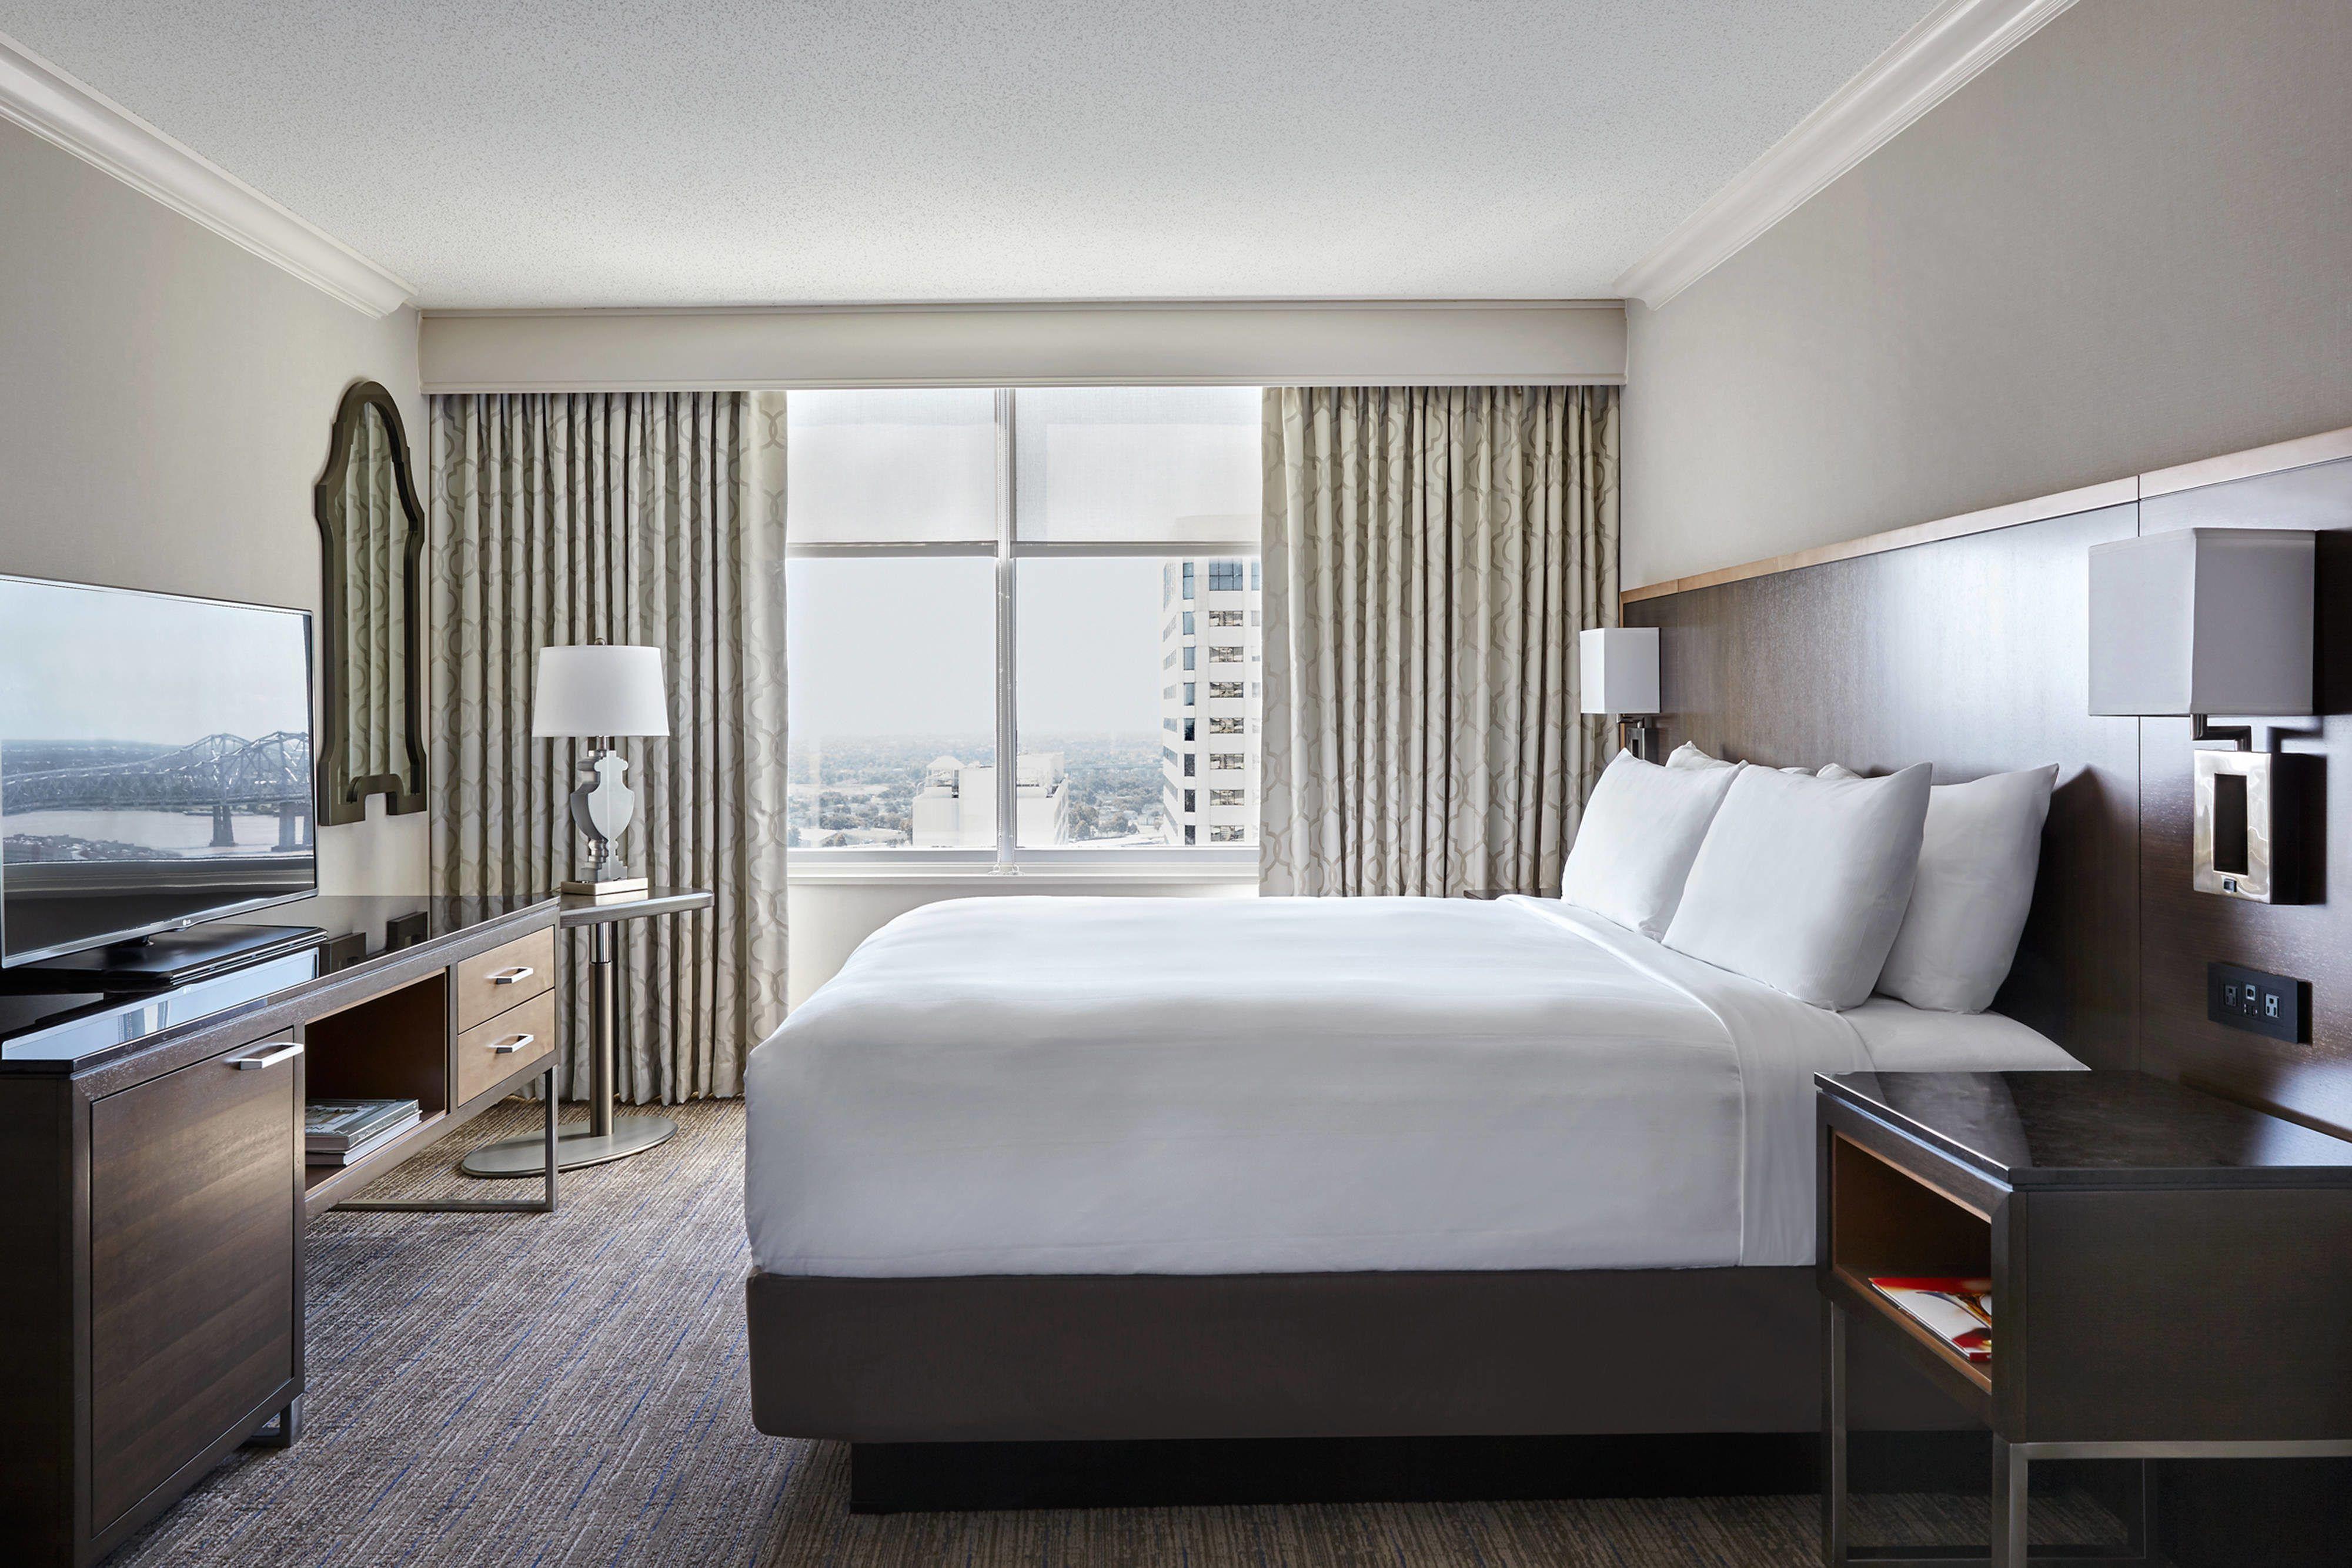 New Orleans Marriott Crescent City Suite King Bedroom Guestbathroom Comfortable Hotels City Suites French Quarter Hotels New Orleans Hotels